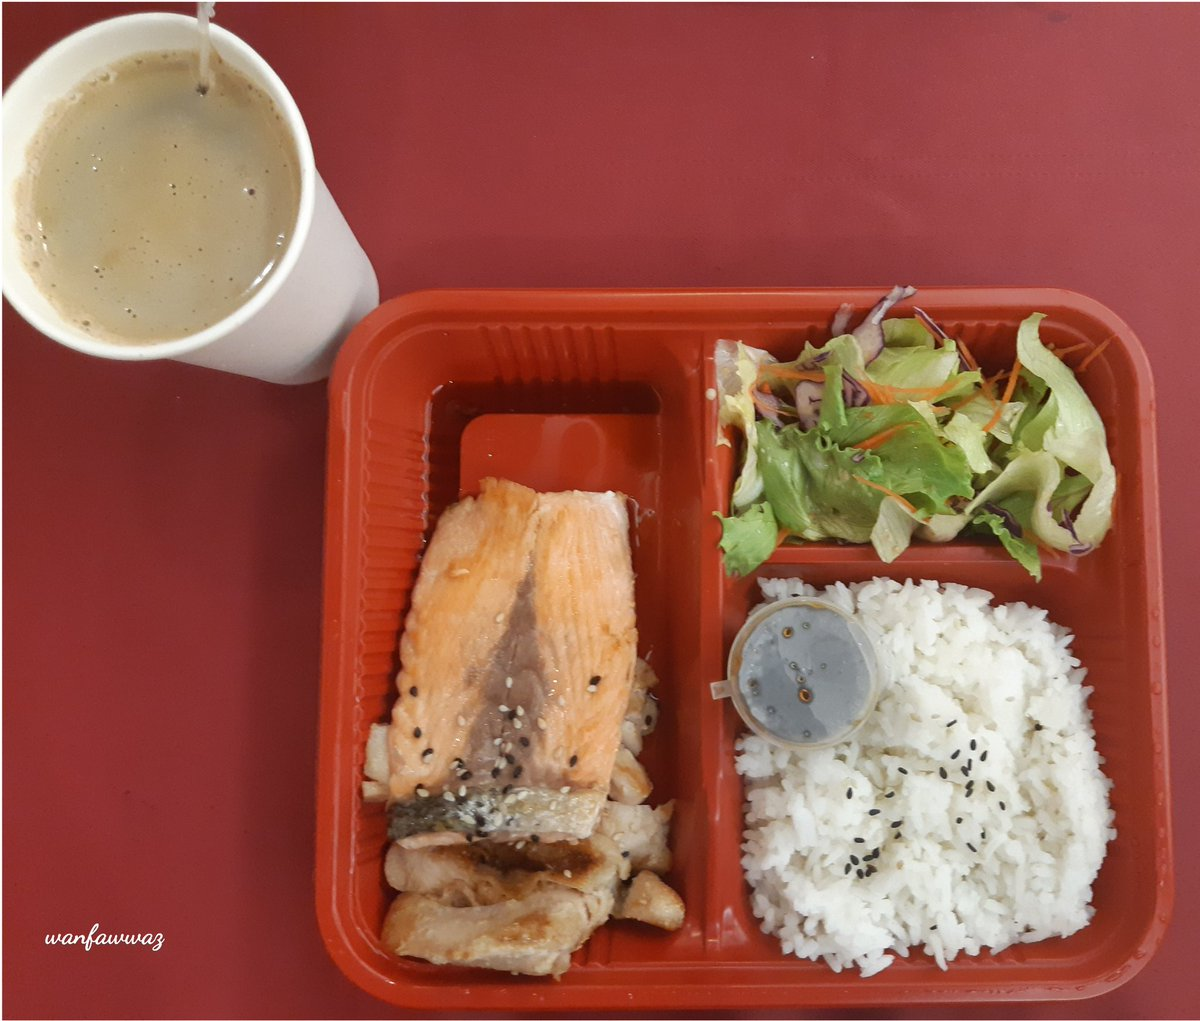 OISHI Delivery & Catering  #PicOfTheDay #Like #Food #Lunch #Life #Eat #Nippon #KL #instafood #Oishi #Jalanjalancarimakan #Factory